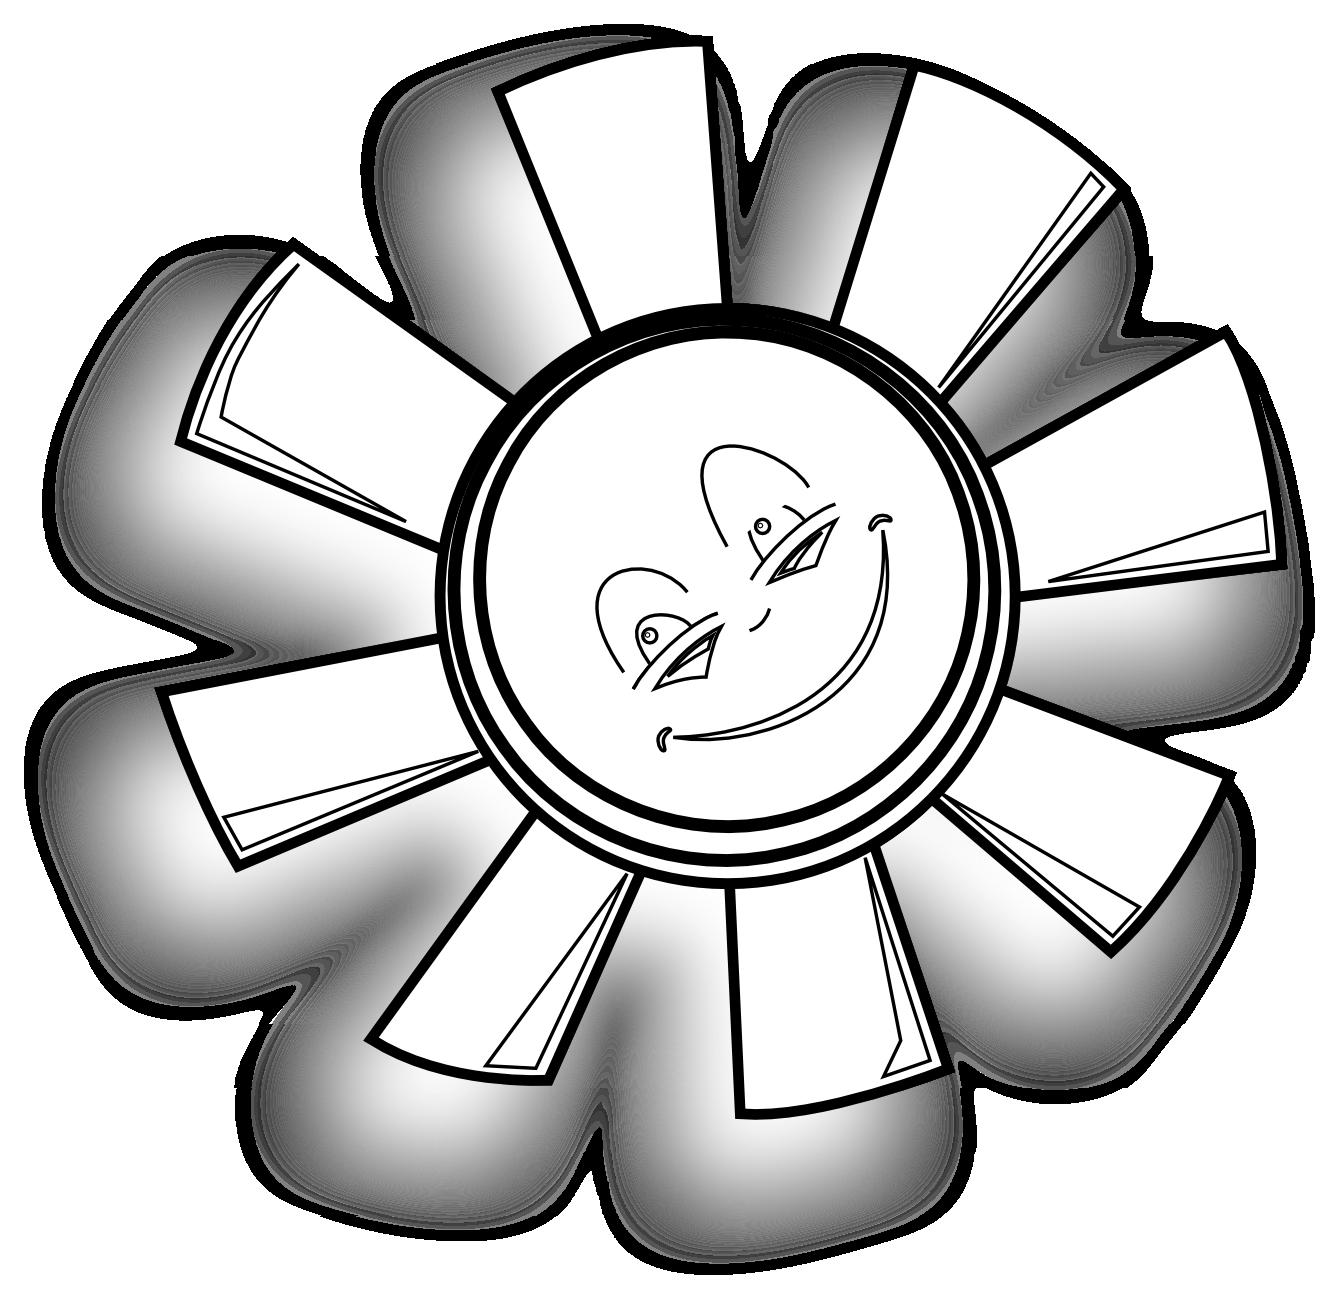 happy sun gm black white line art scalable vector graphics svg.